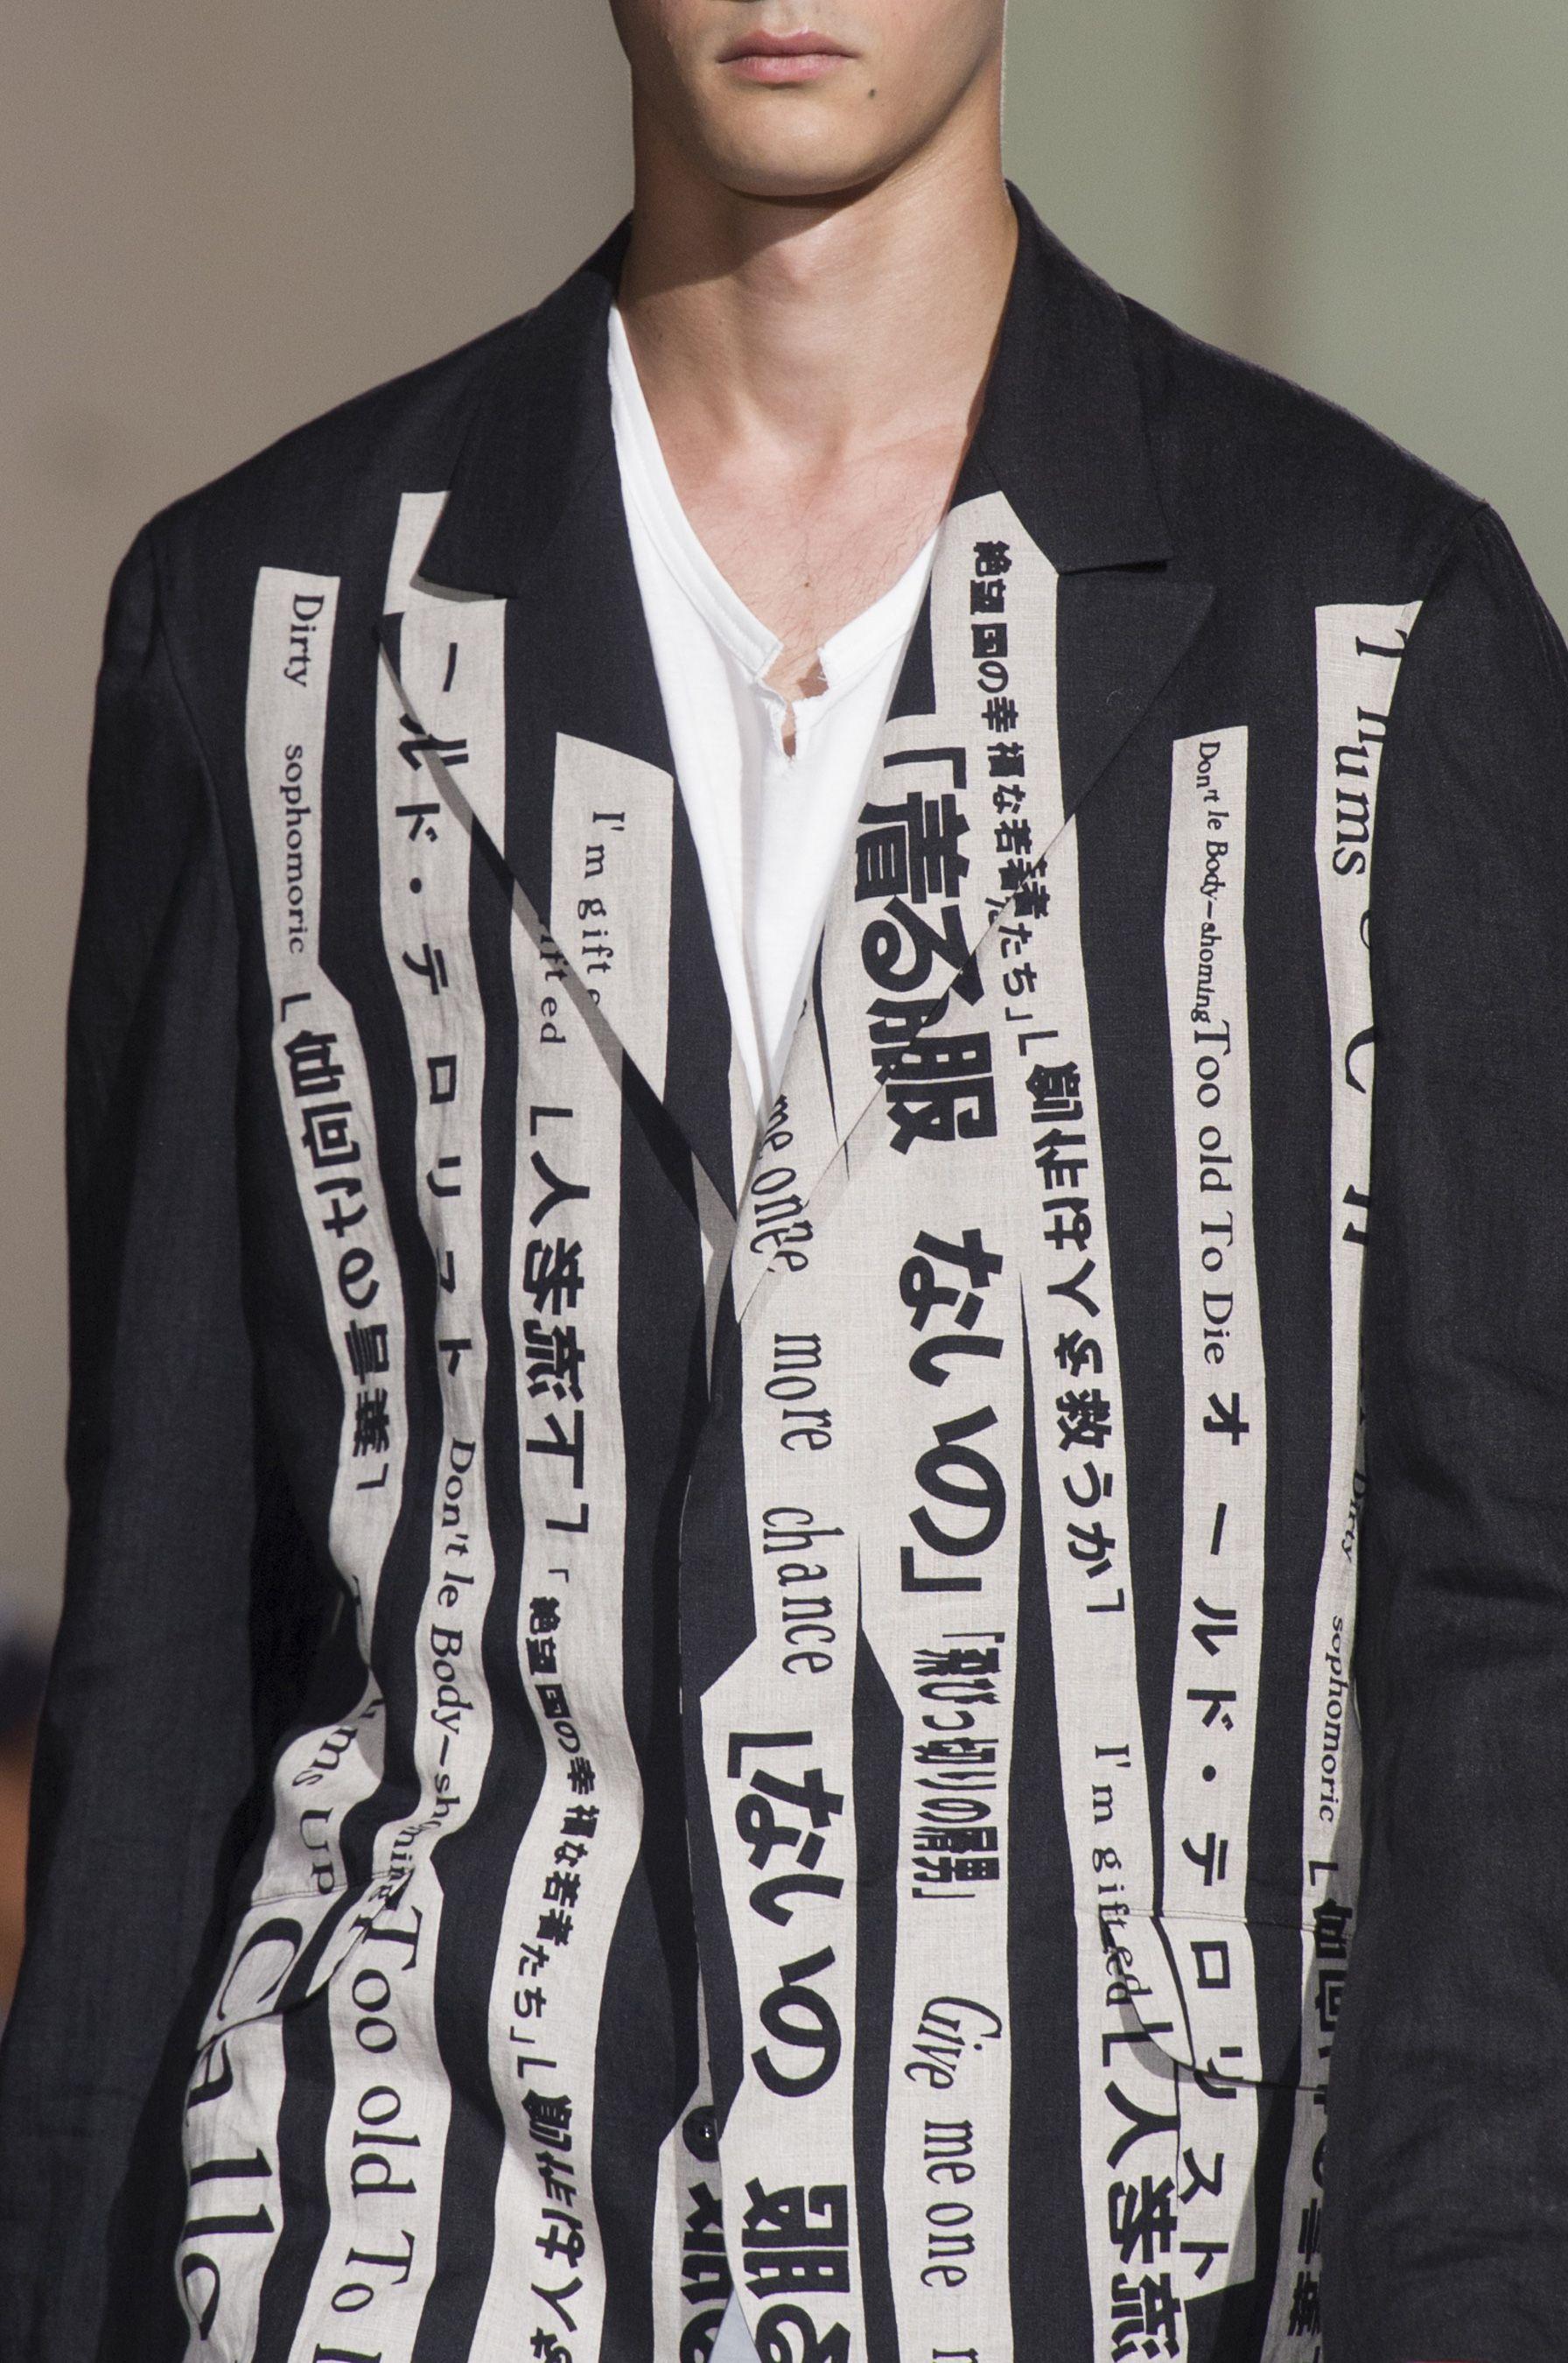 b291698ec122 Yohji Yamamoto Spring 2018 Men s Fashion Show Details